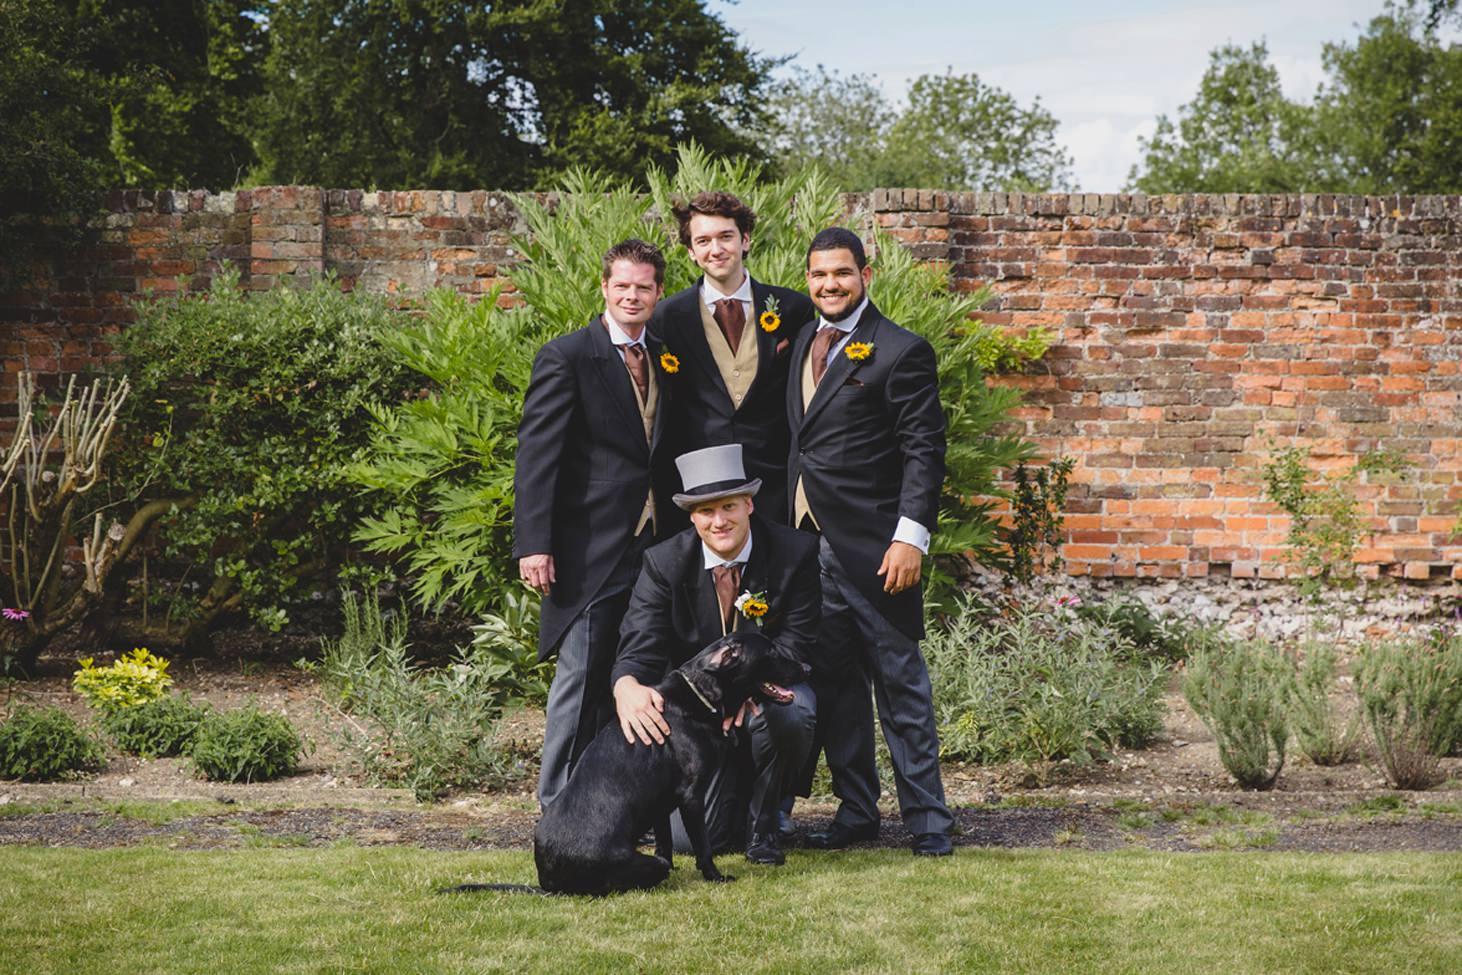 Wycombe Abbey wedding photography groomsmen portrait with dog